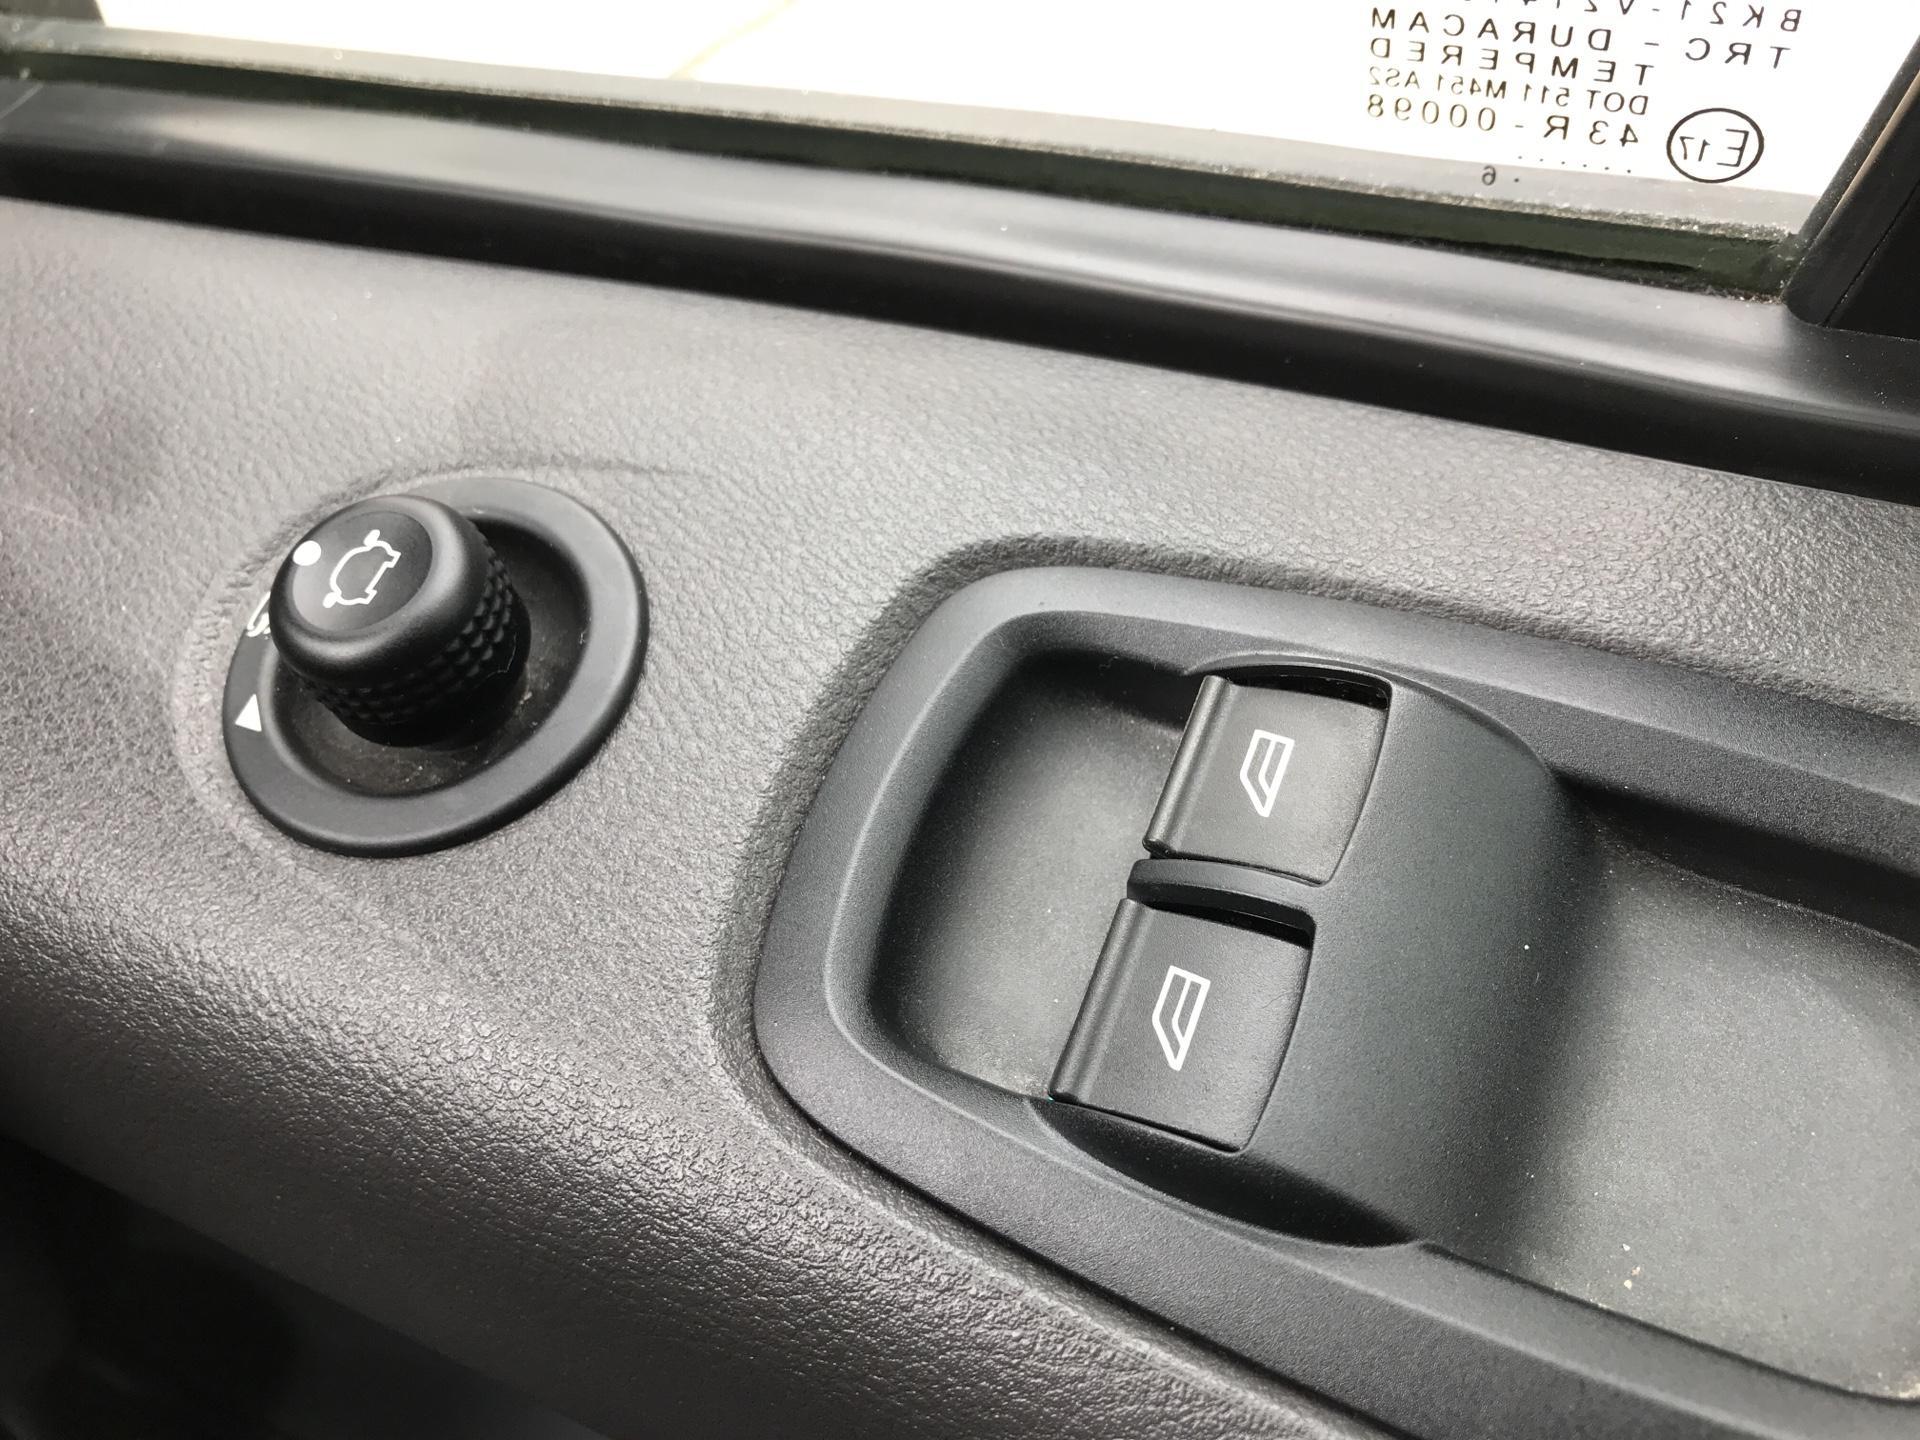 2016 Ford Transit Custom 290 L1 DIESEL FWD 2.2 TDCI 125PS LOW ROOF LIMITED VAN EURO 5 (DV16OKP) Image 19